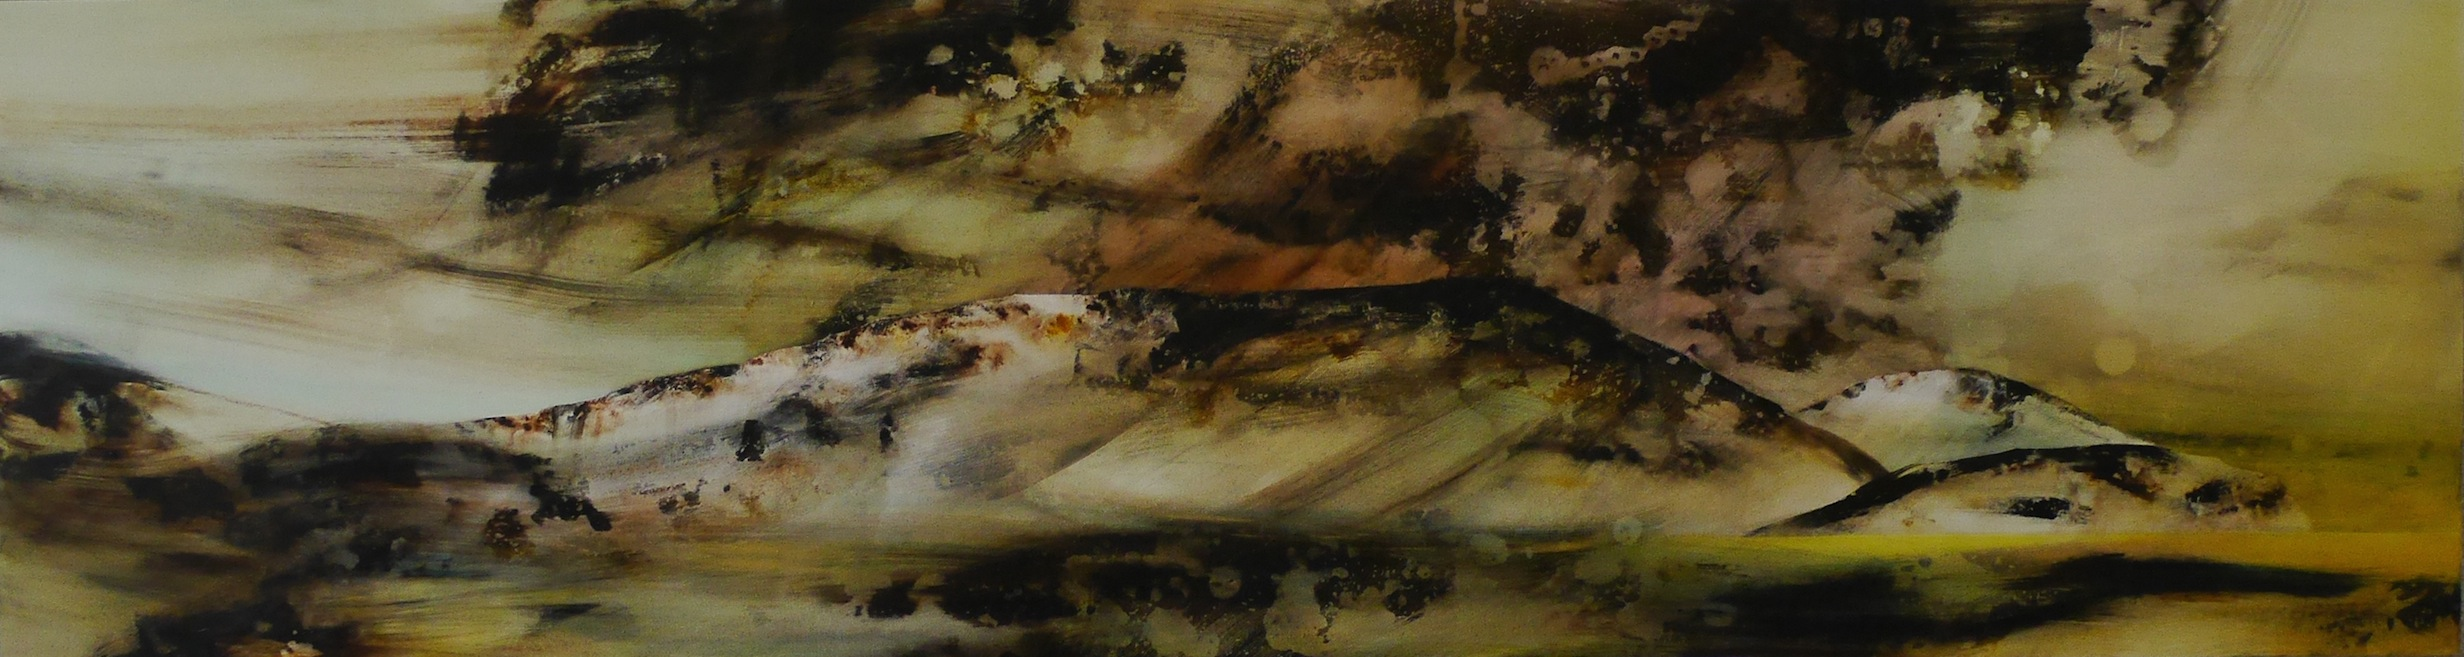 Wyn-Lyn TAN   (In)visible Horizons VII   2017  Acrylic on canvas  H54 x W200 cm